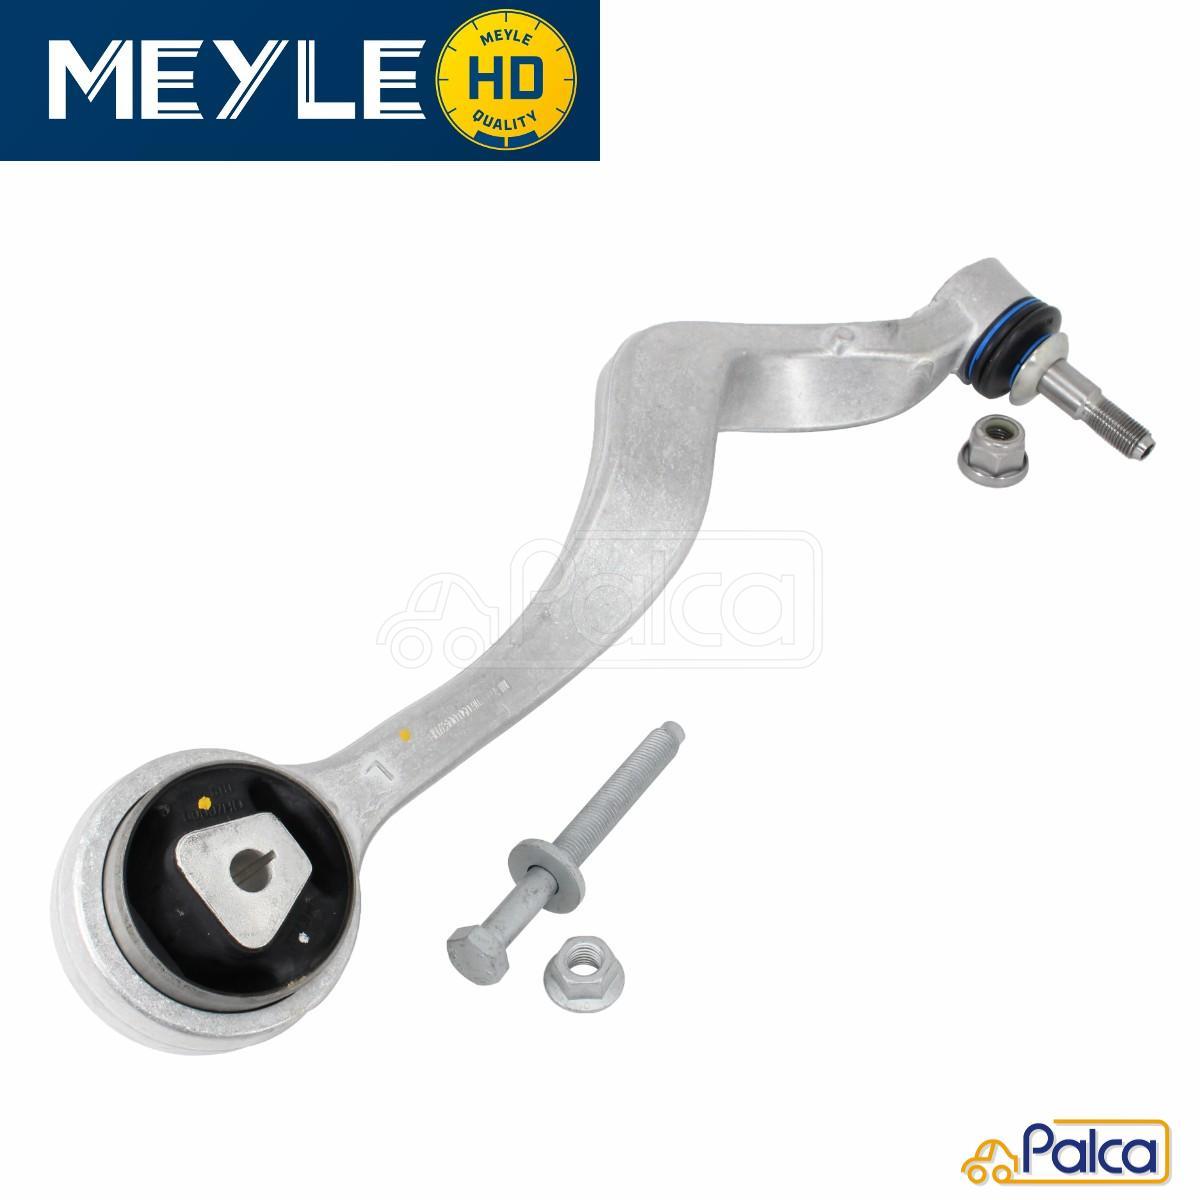 MEYLE製 【あす楽】BMW フロント プルストラットアーム/ロアアーム 前側 左 耐久強化HD品 E63,E64/630i,645Ci,650i,M6 | MEYLE製 31102348049